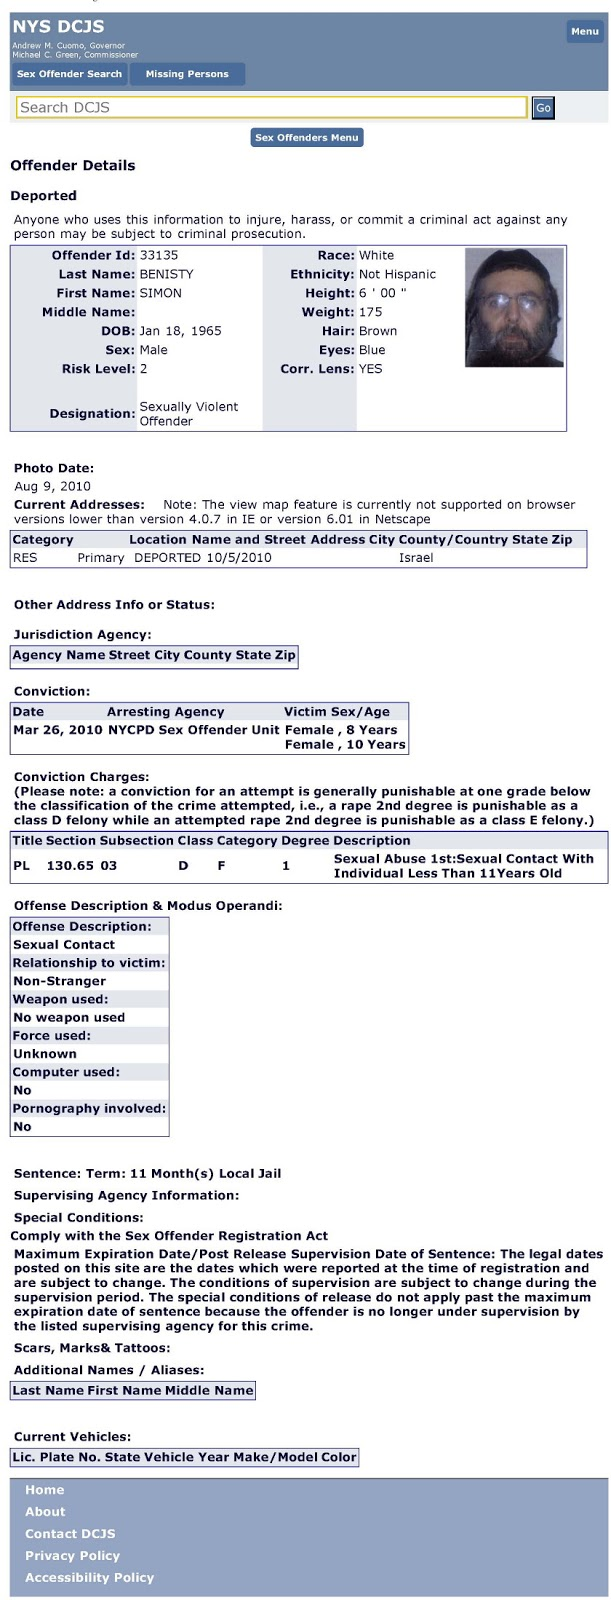 Sex Offender Registry - Legal